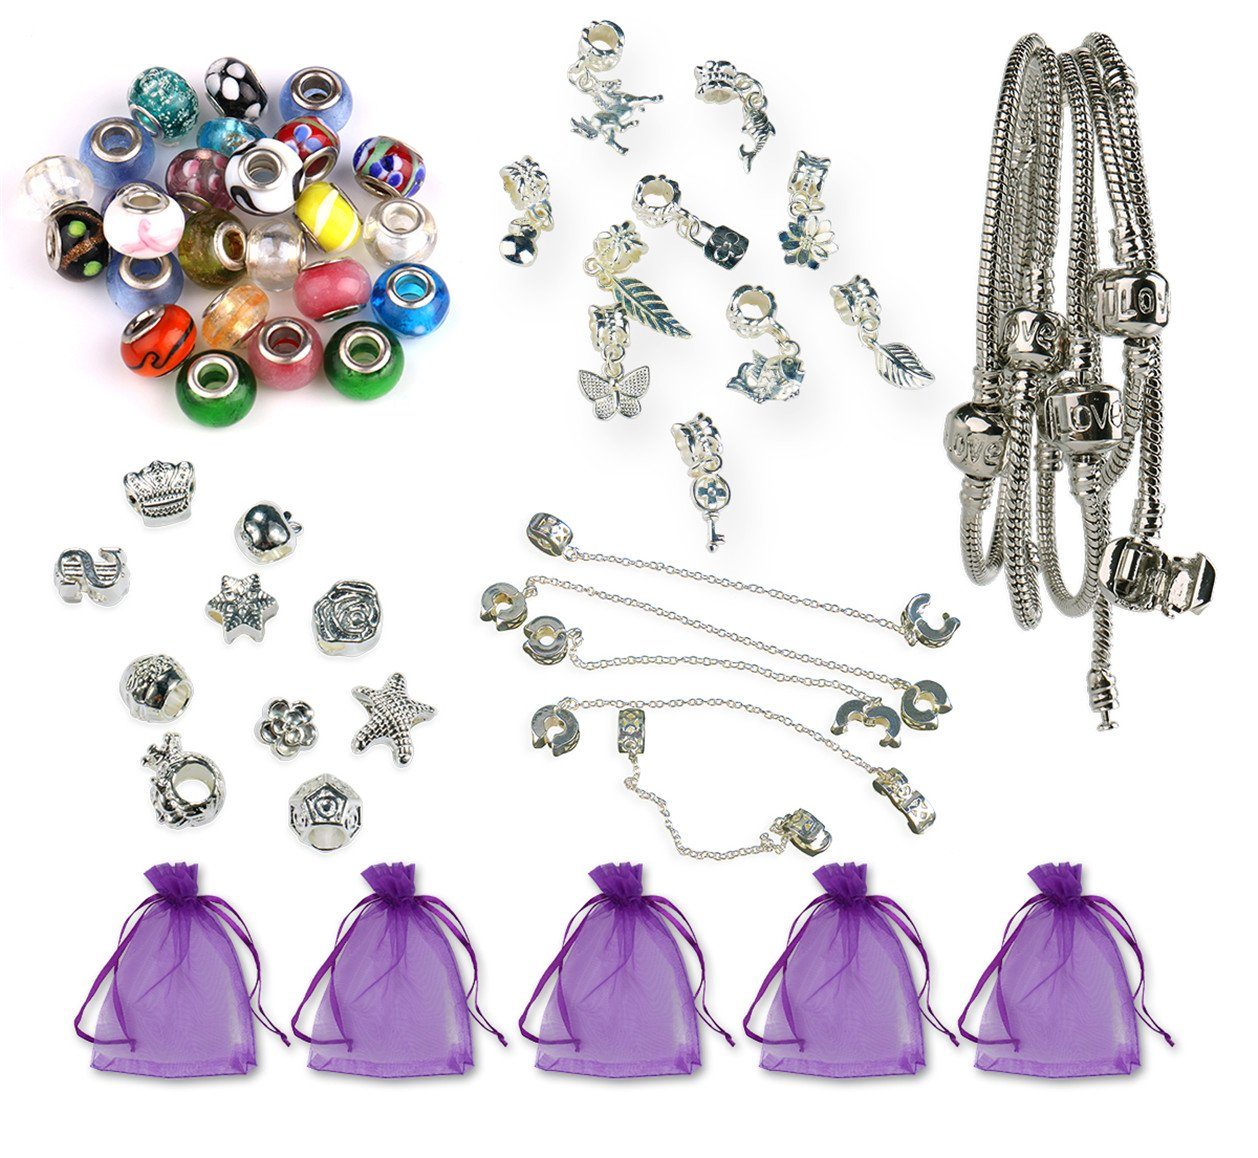 10 x Tibetan Silver FEATHER Charms Pendant Bead